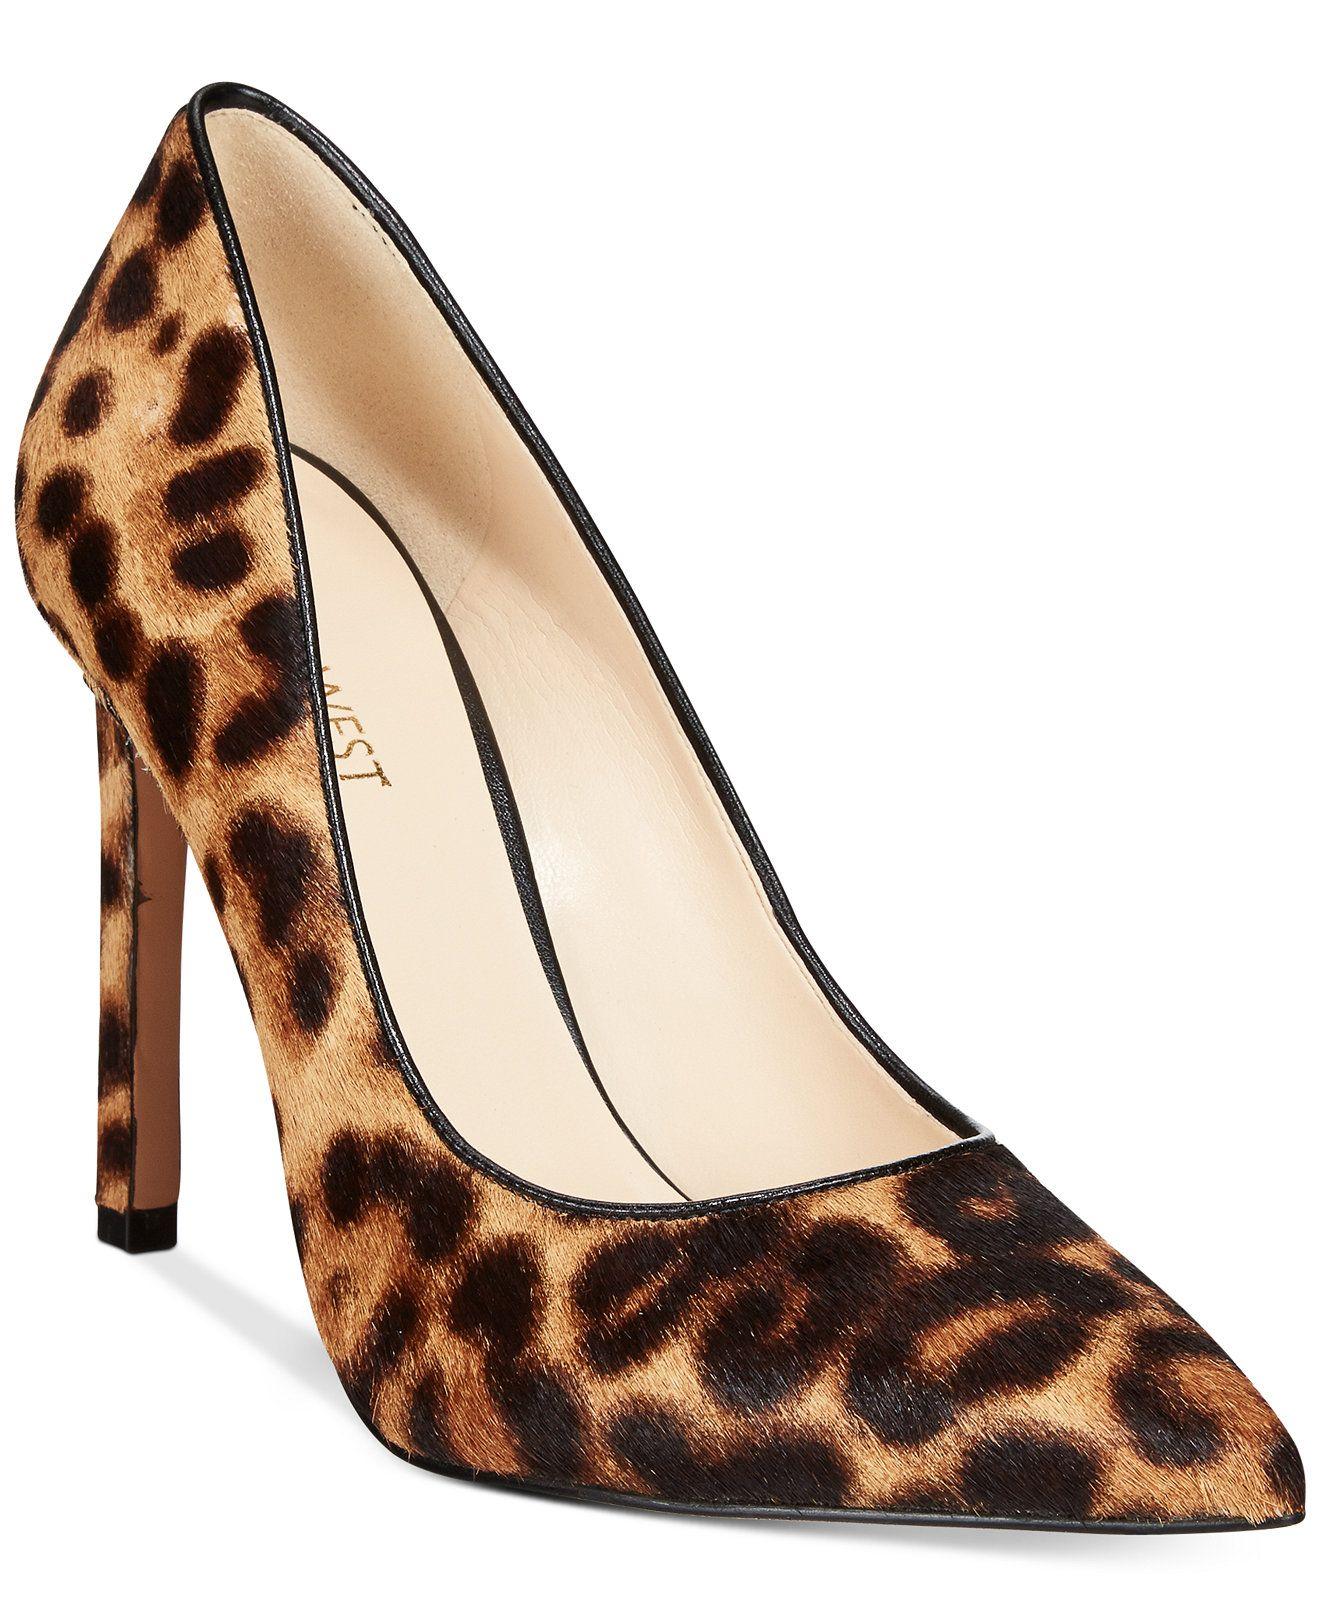 a7fe6095ec48 Nine West Tatiana Pumps - All Women s Shoes - Shoes - Macy s ...